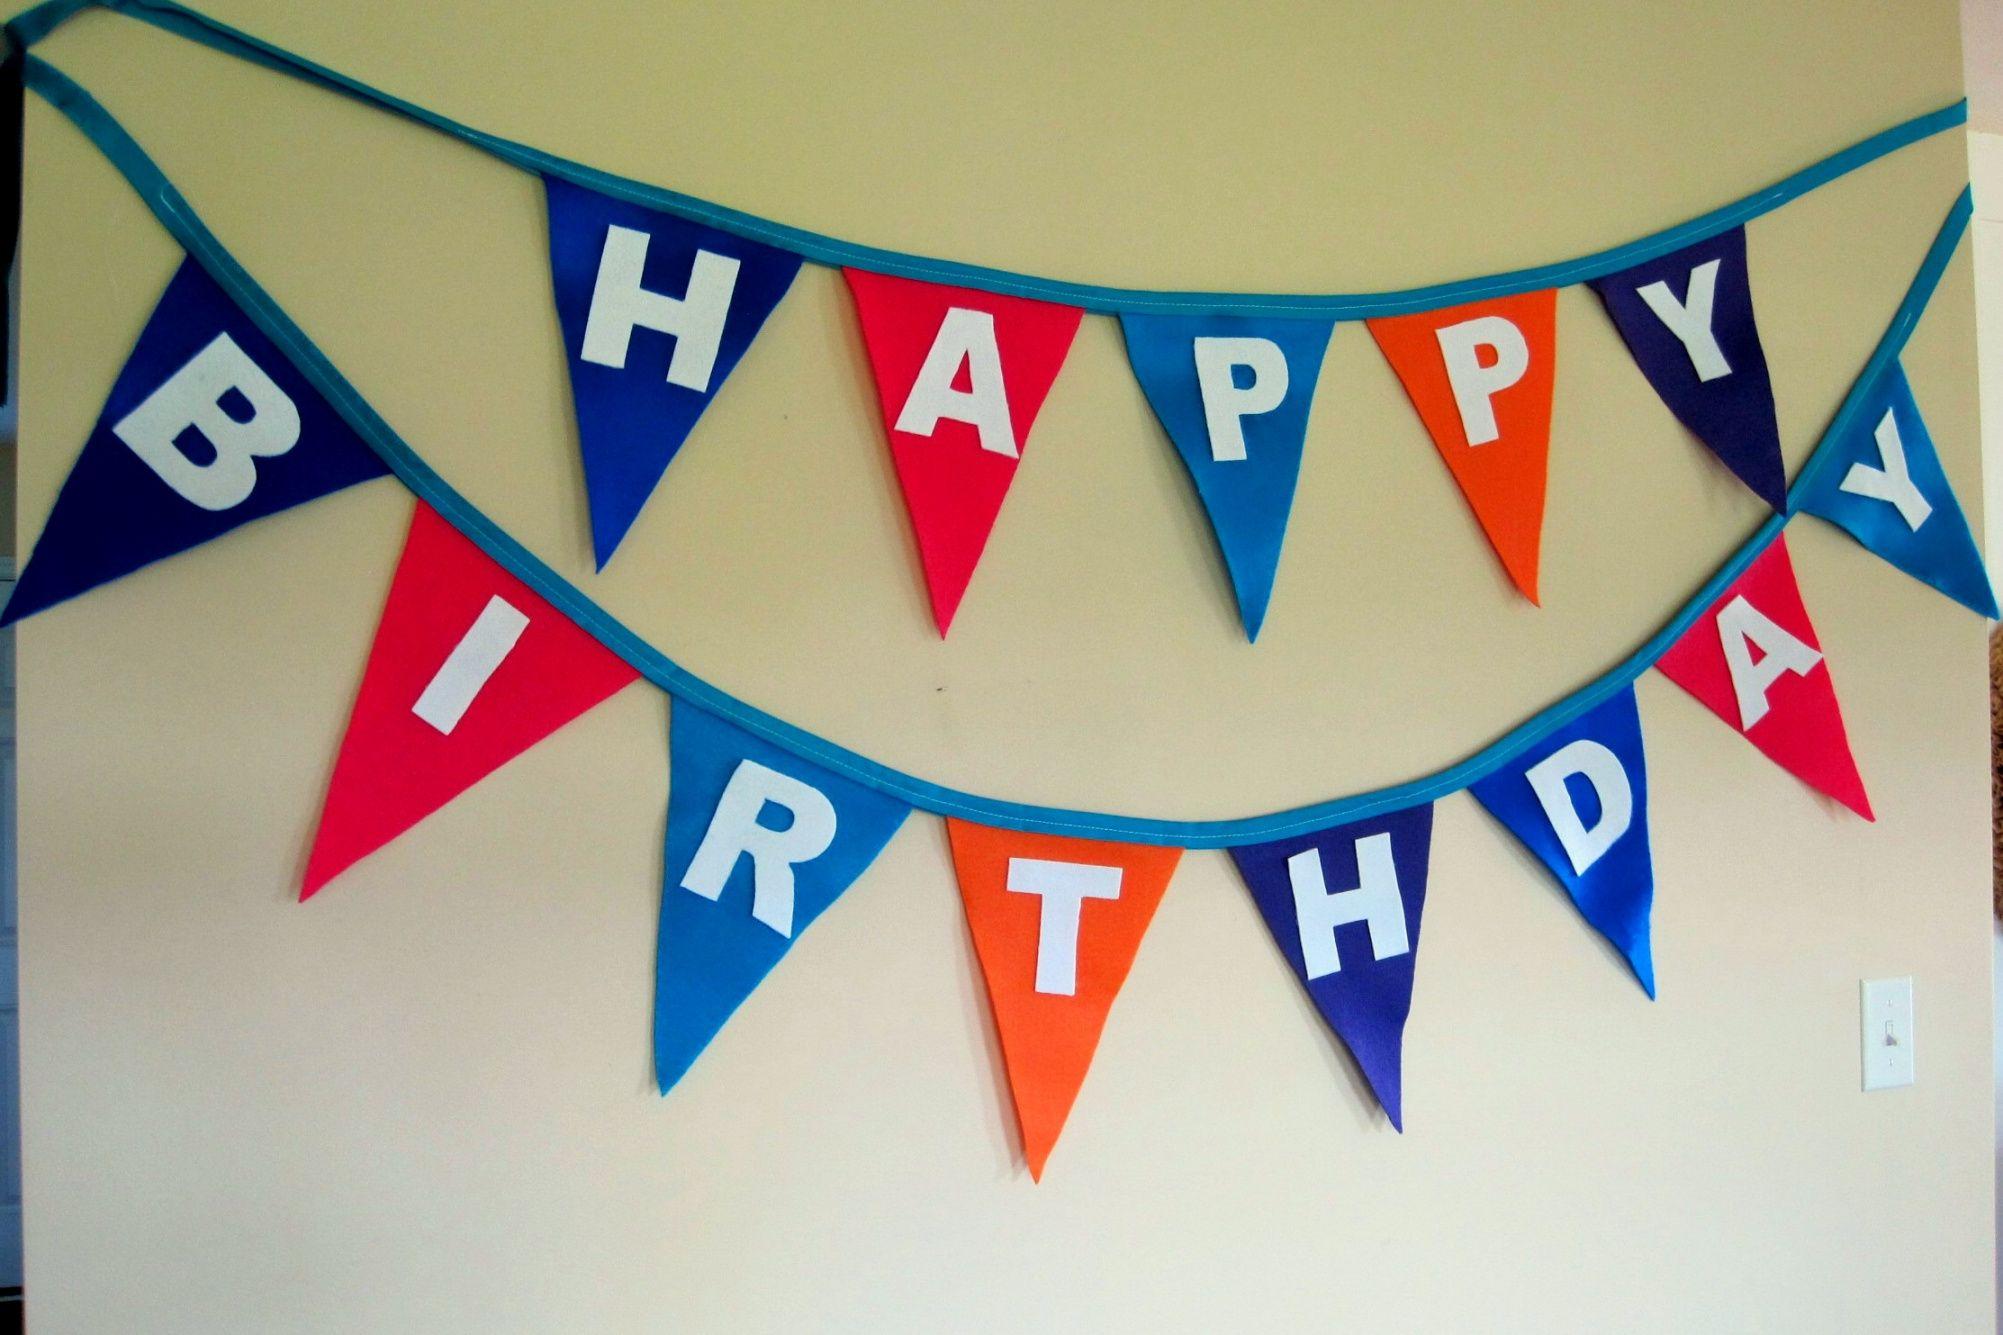 editable birthday banner template  happy birthday banner party banner template pdf